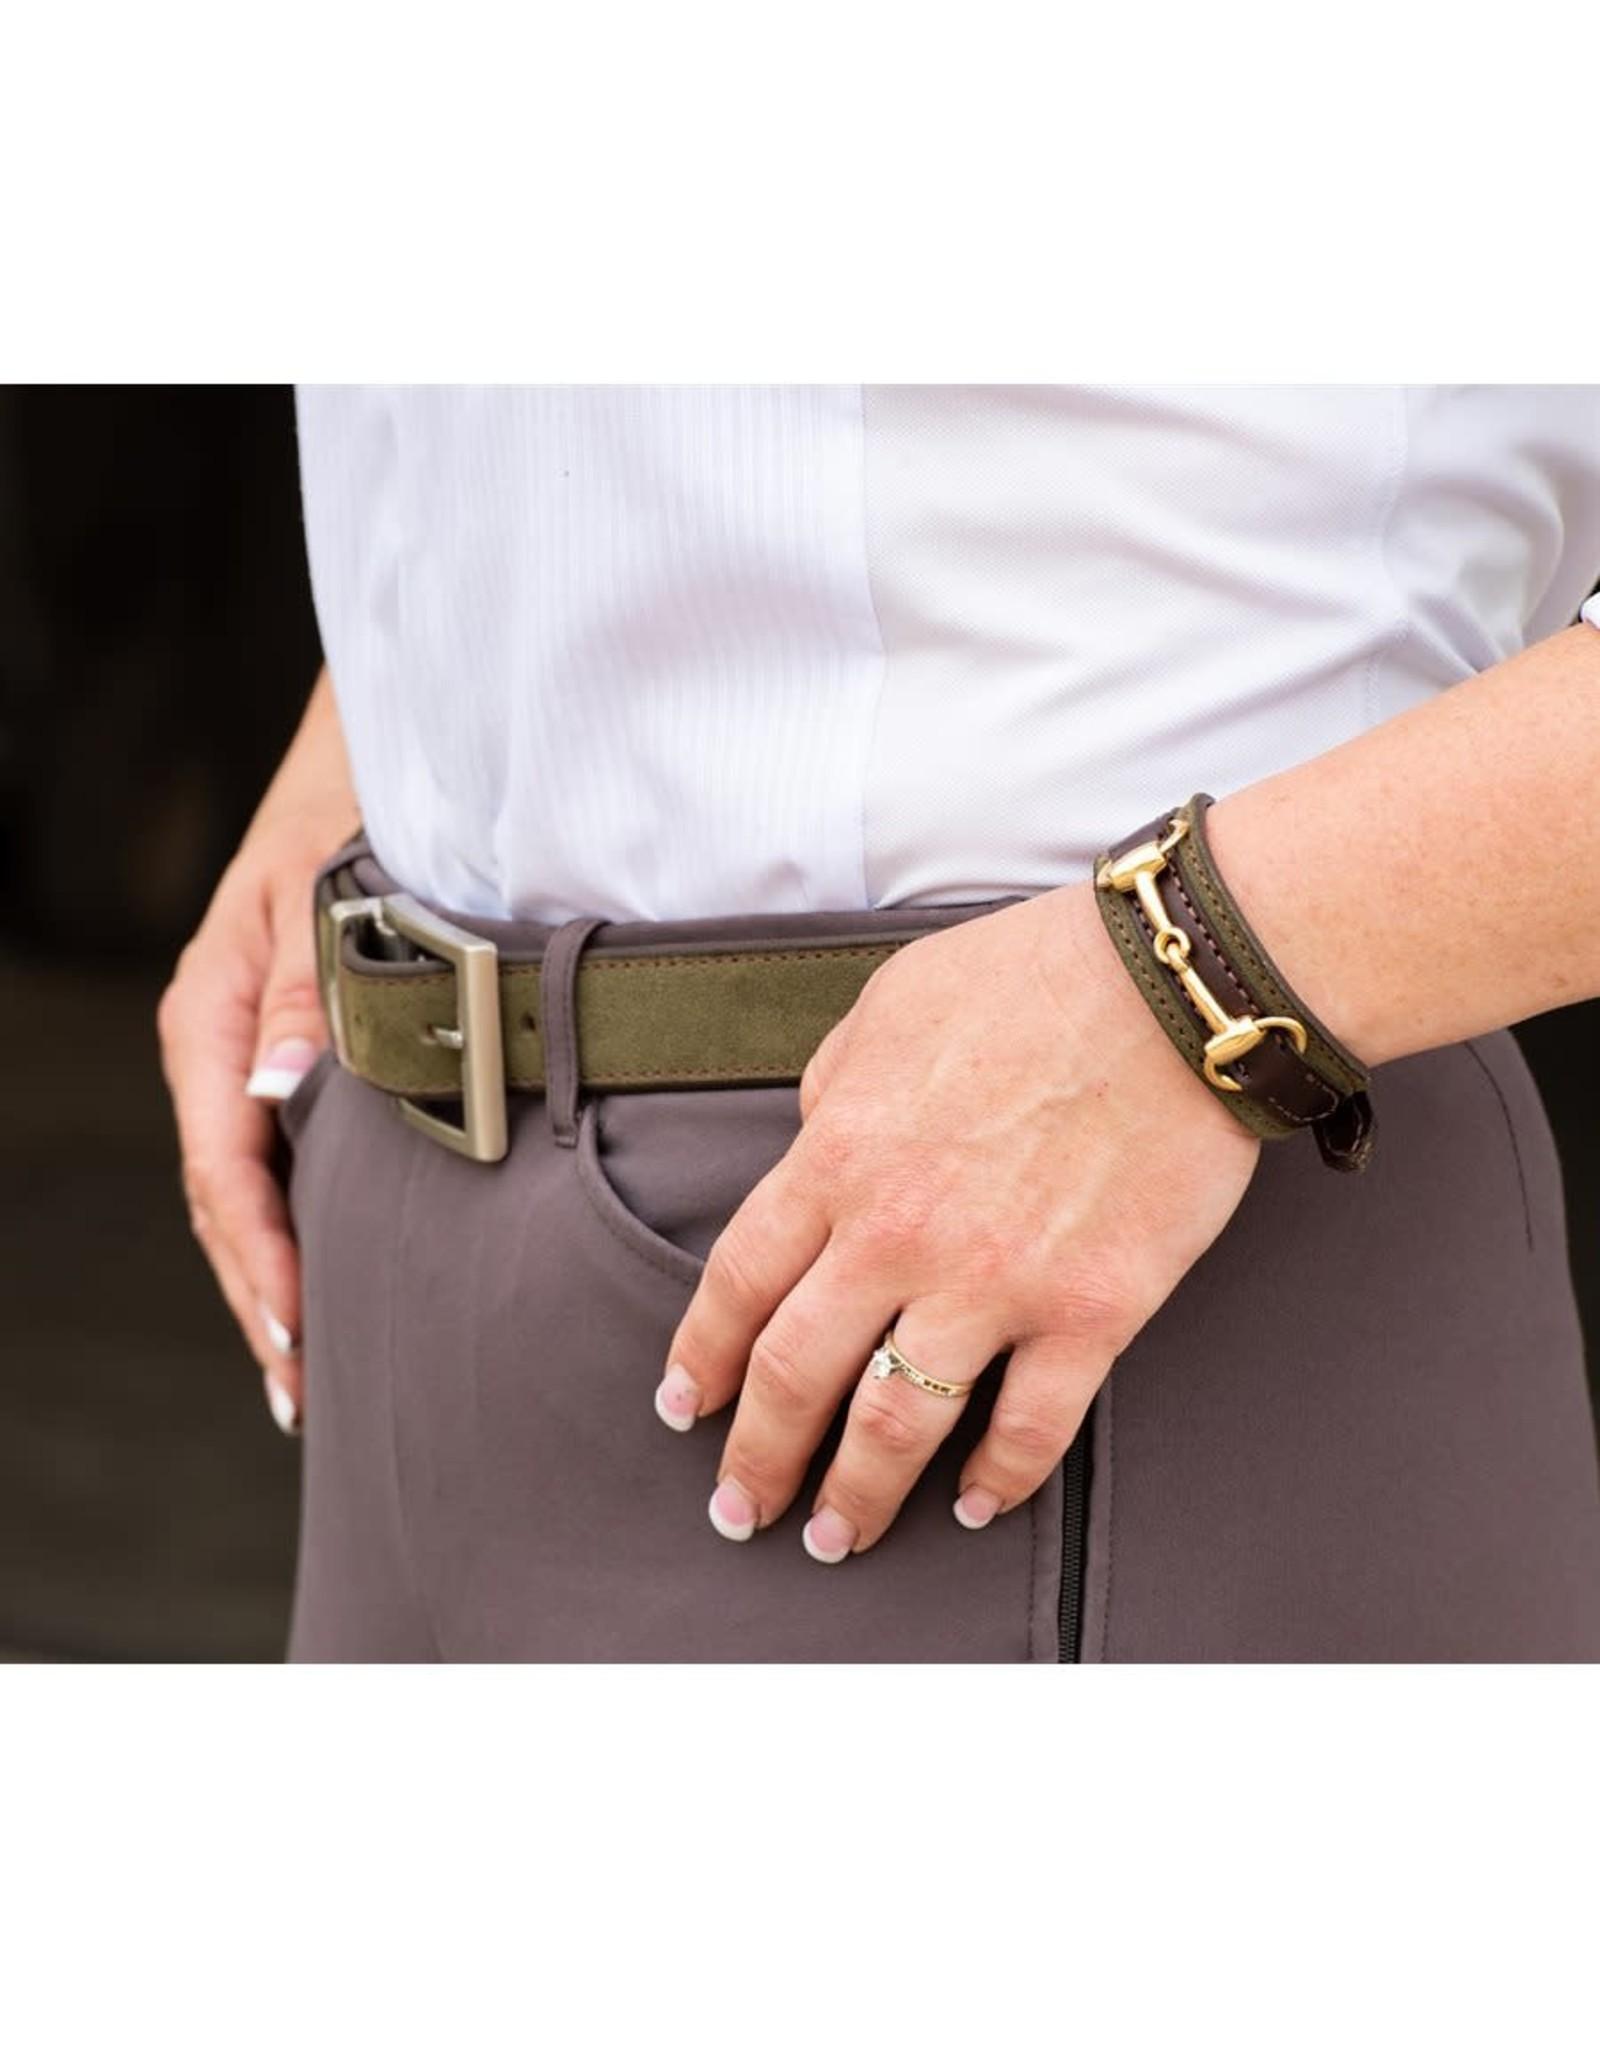 Perri's Bracelet Overlay Bit